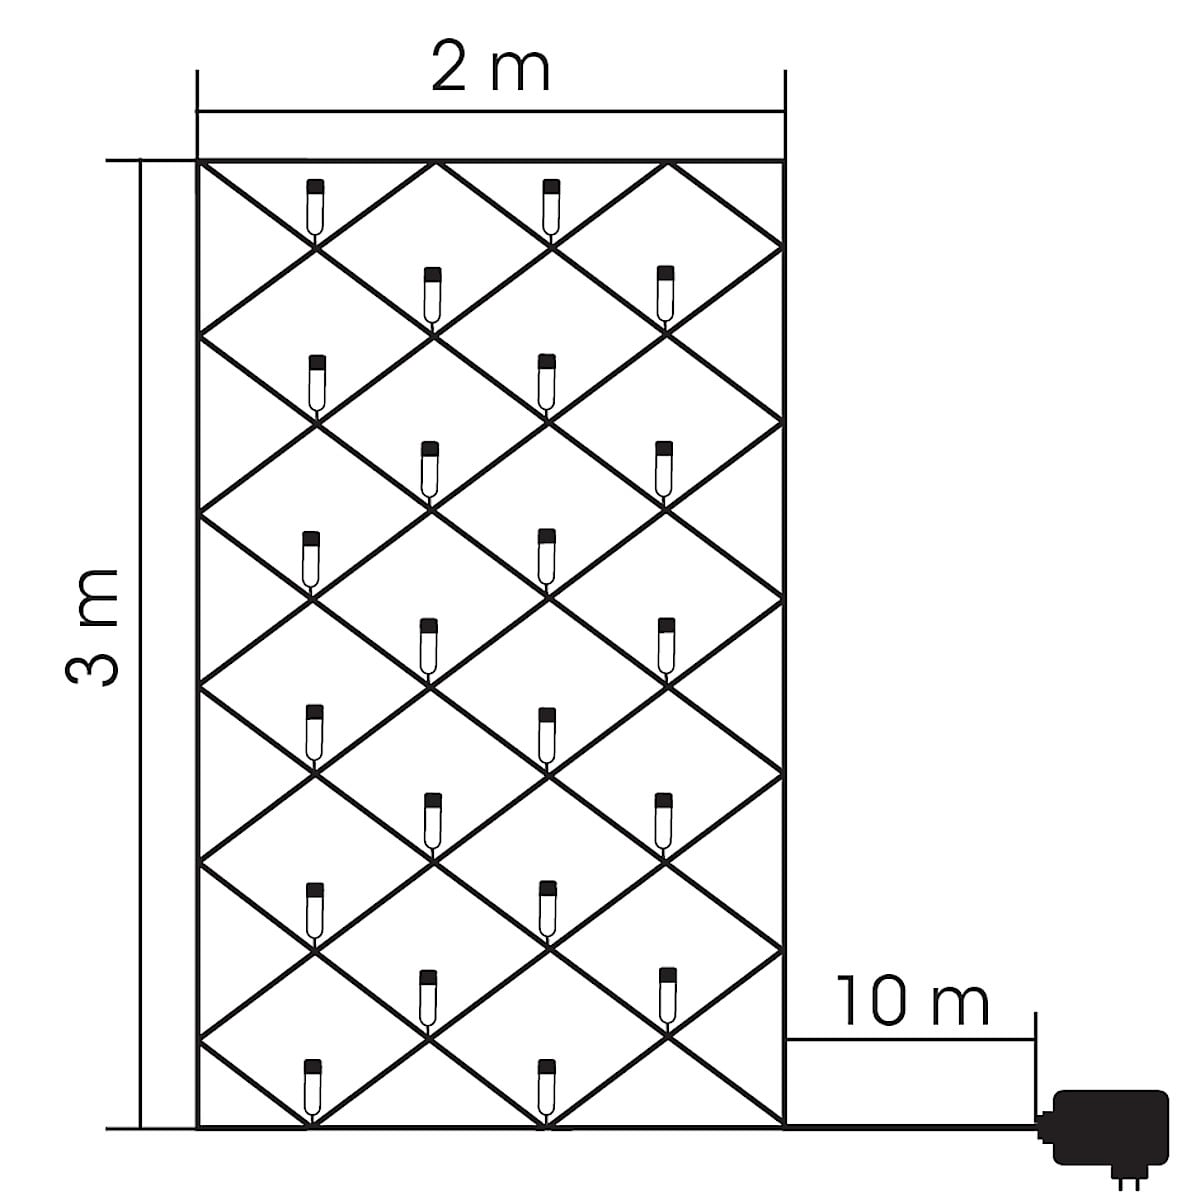 LED-valoverkko 2 x 3 m, Northlight